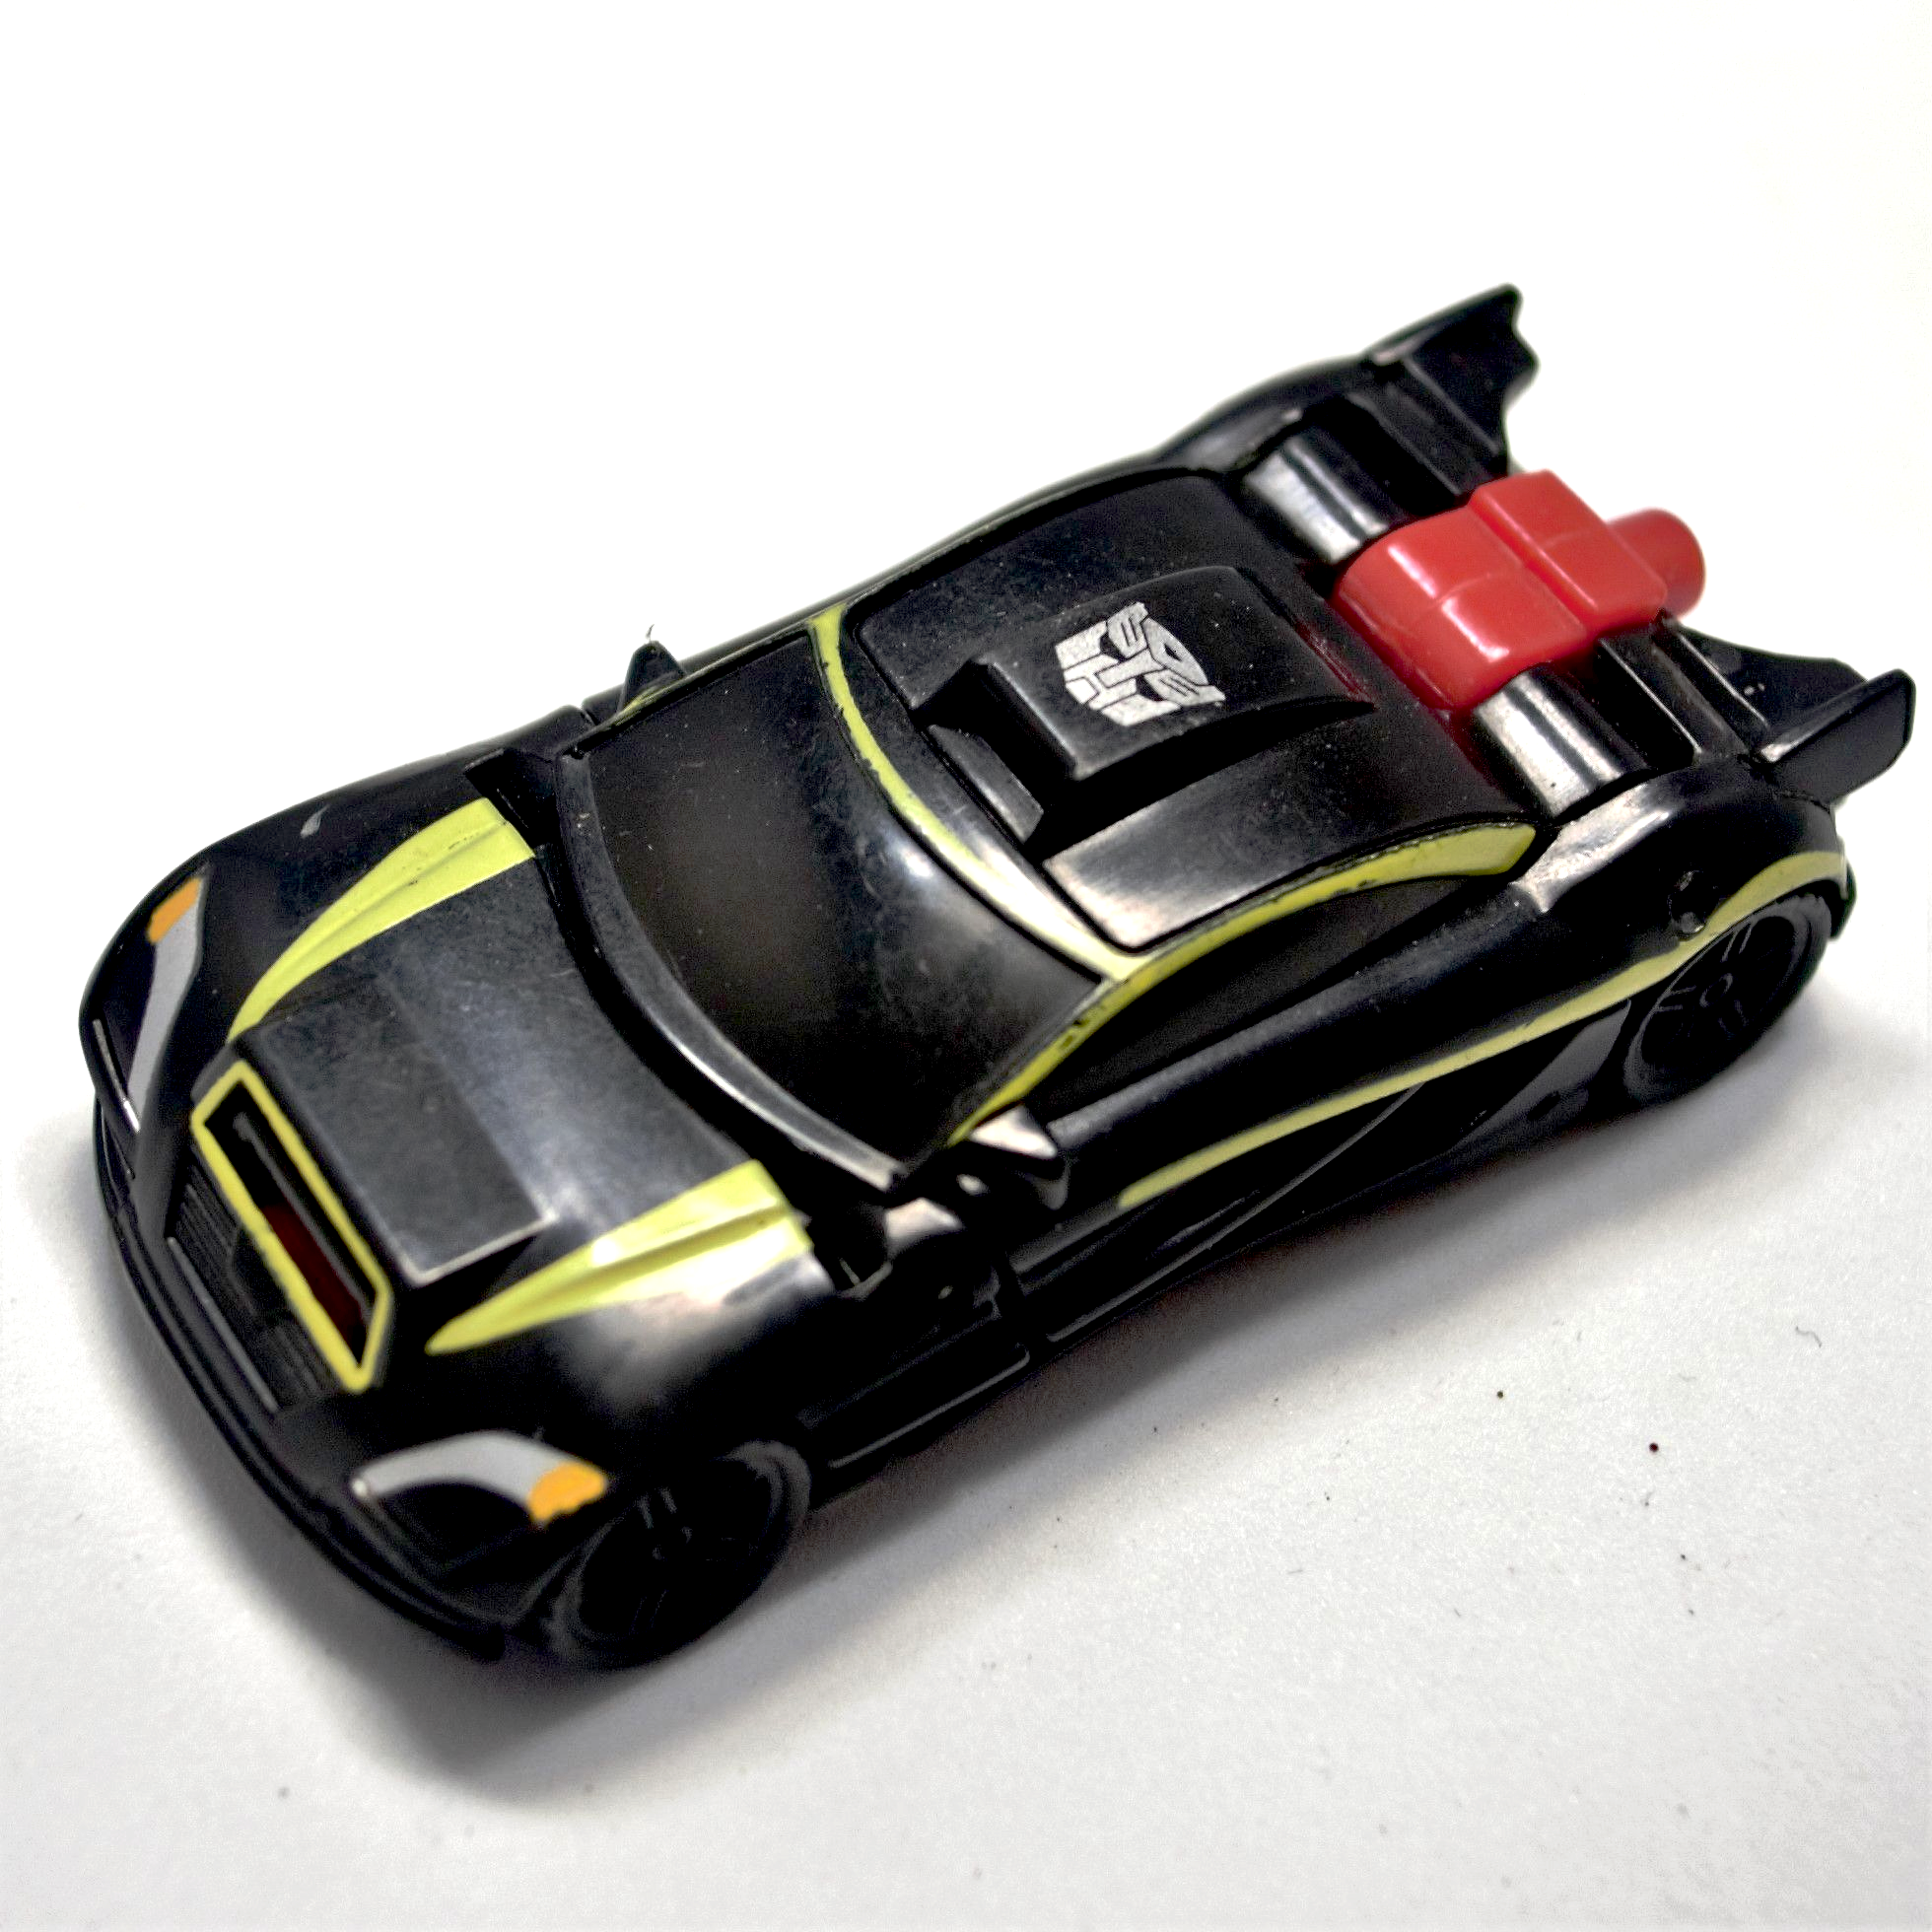 TRANSFORMERS OPTIMUS PRIME MECHTECH  ROBOT TRUCK CAR ACTION FIGURE TOY UK